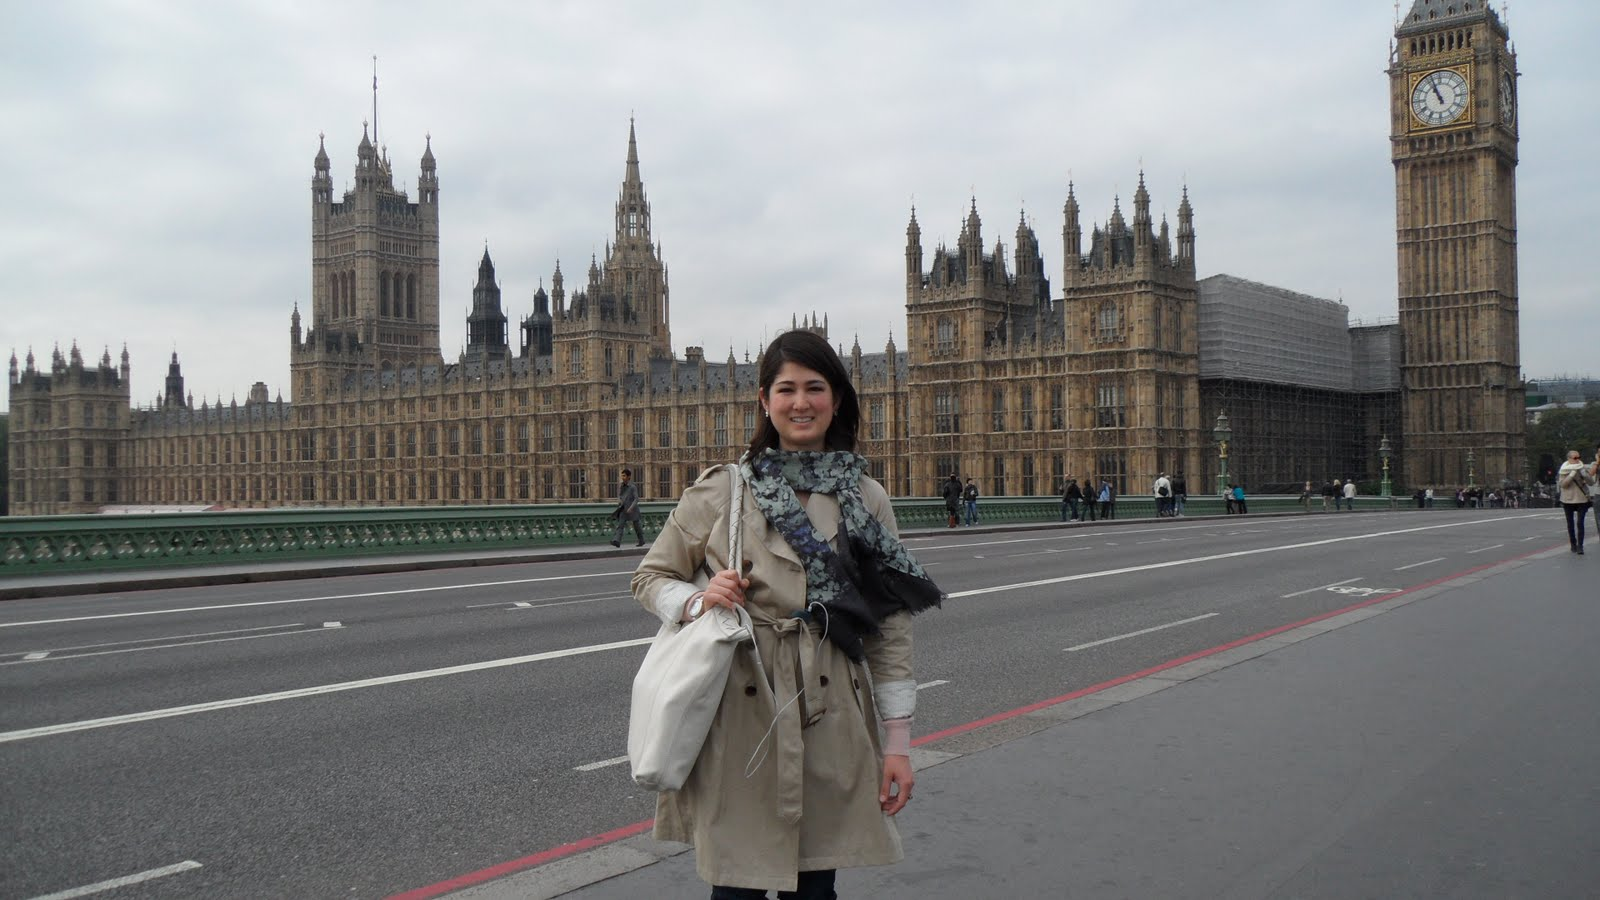 London Weather: Texas Heart, London Eye: It's A Beautiful Day In The